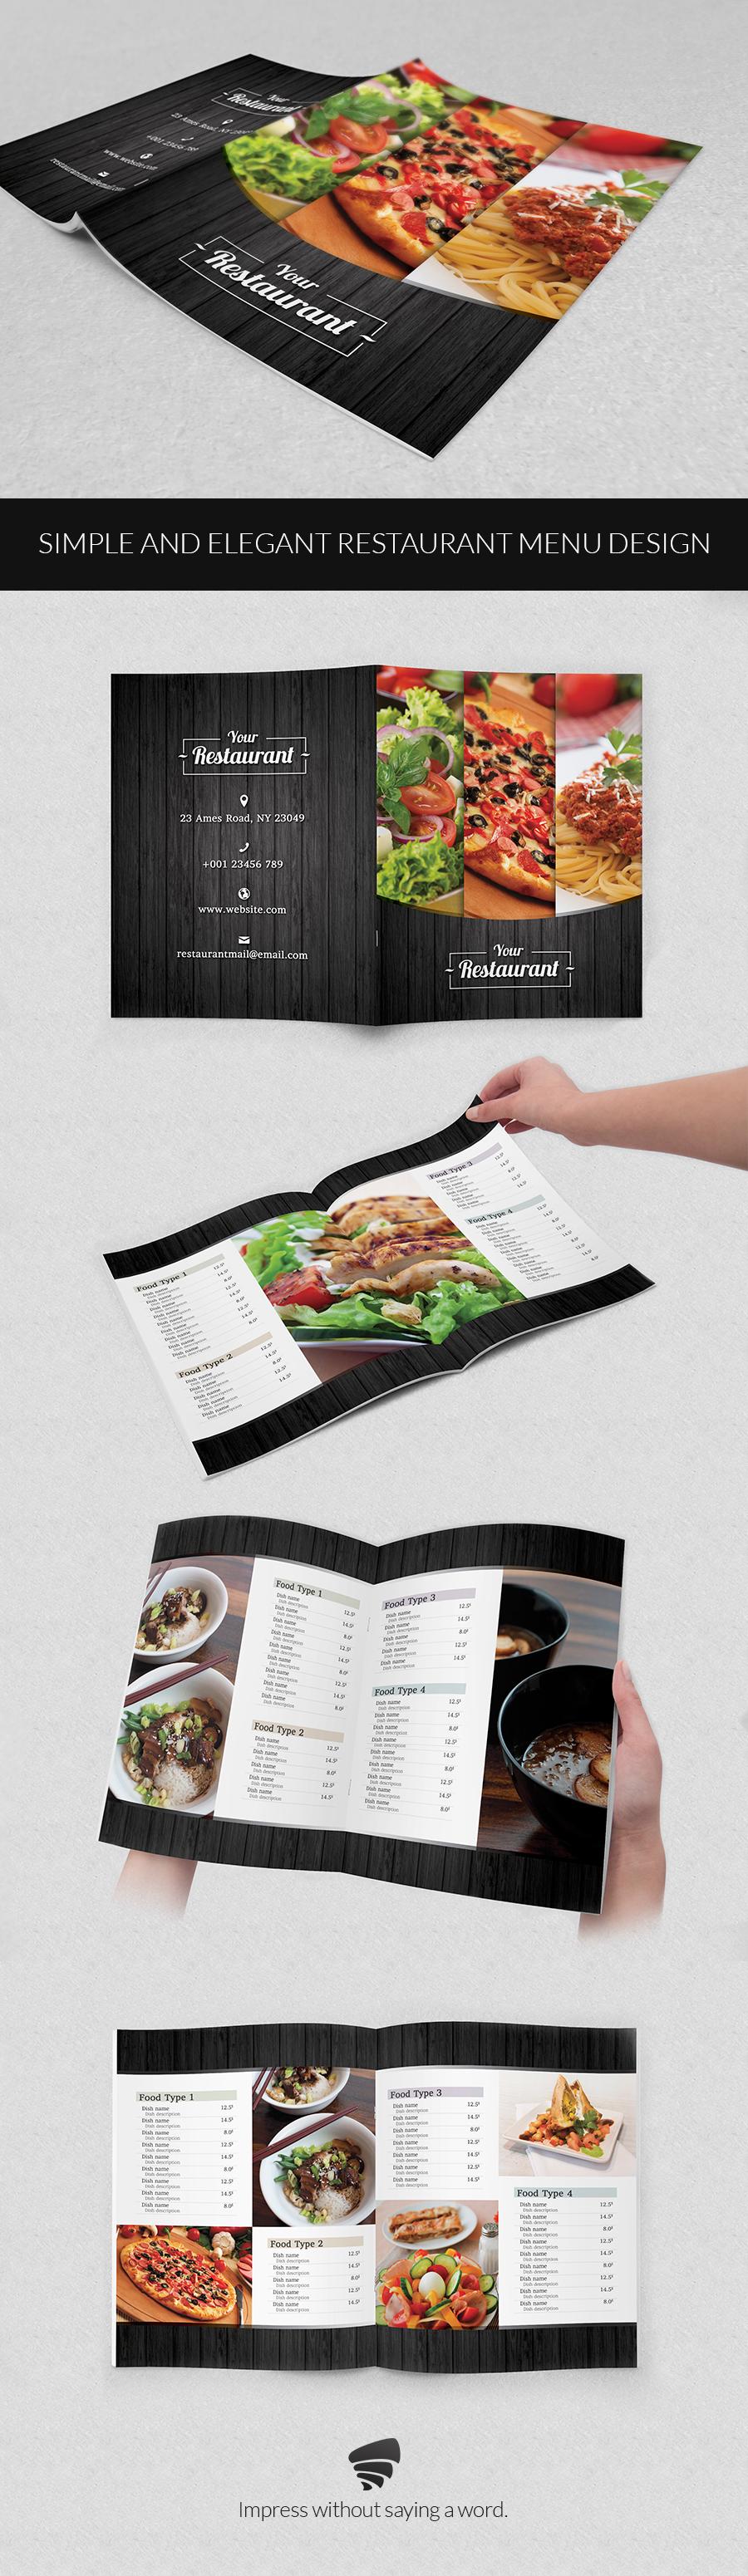 Elegant Restaurant Menu Design On Behance